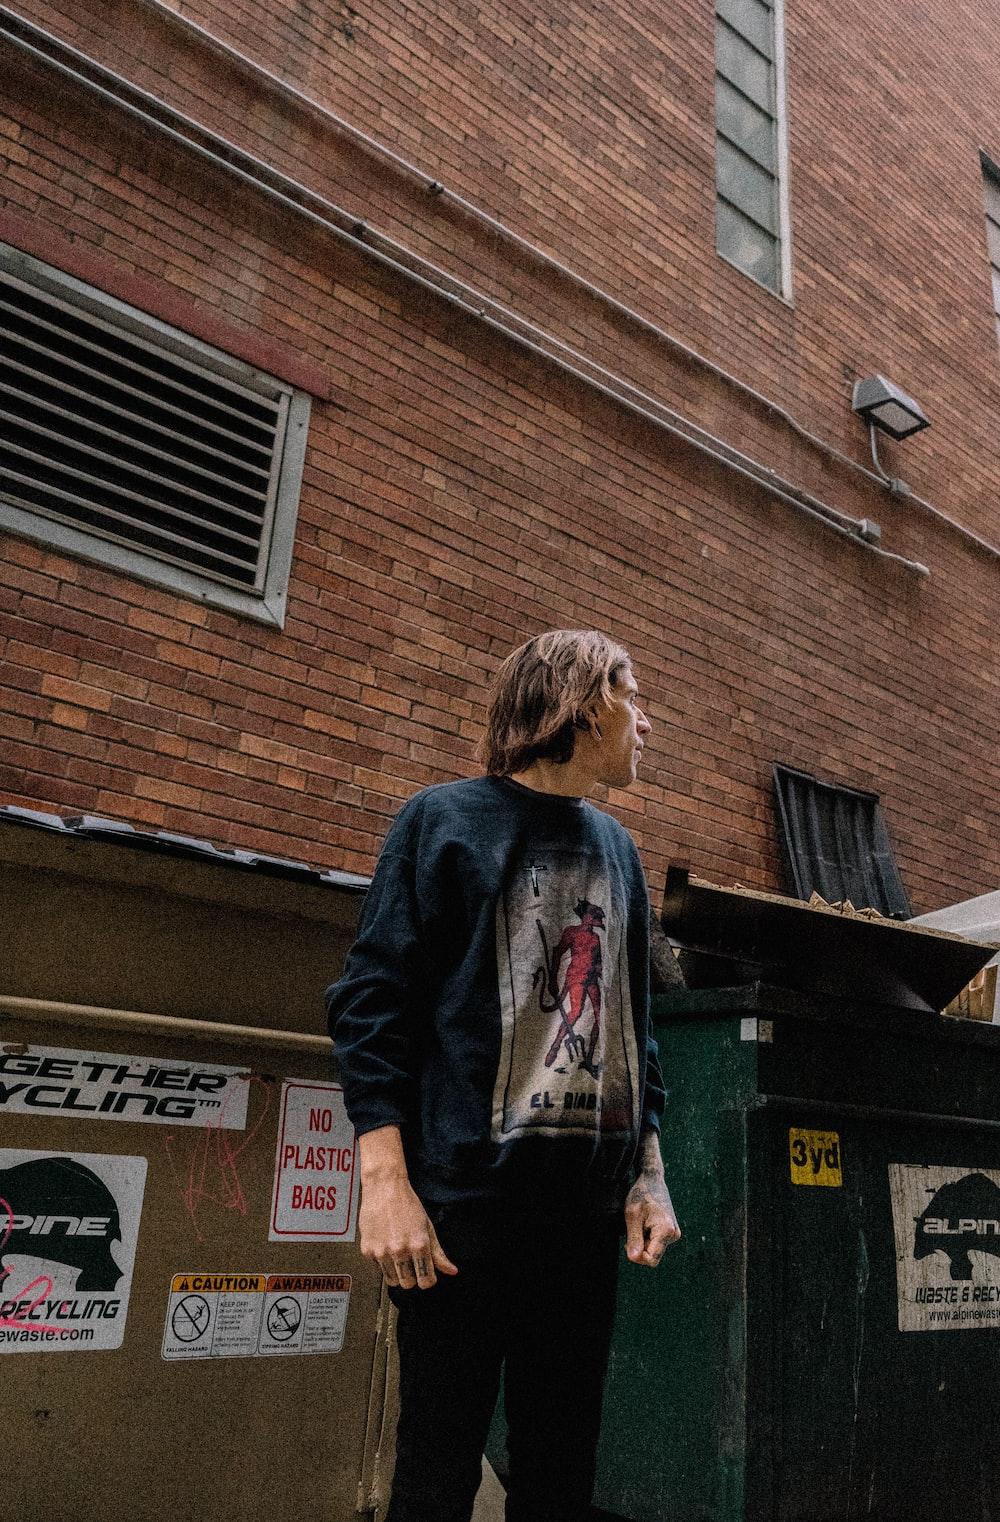 man standing beside building and trash bin